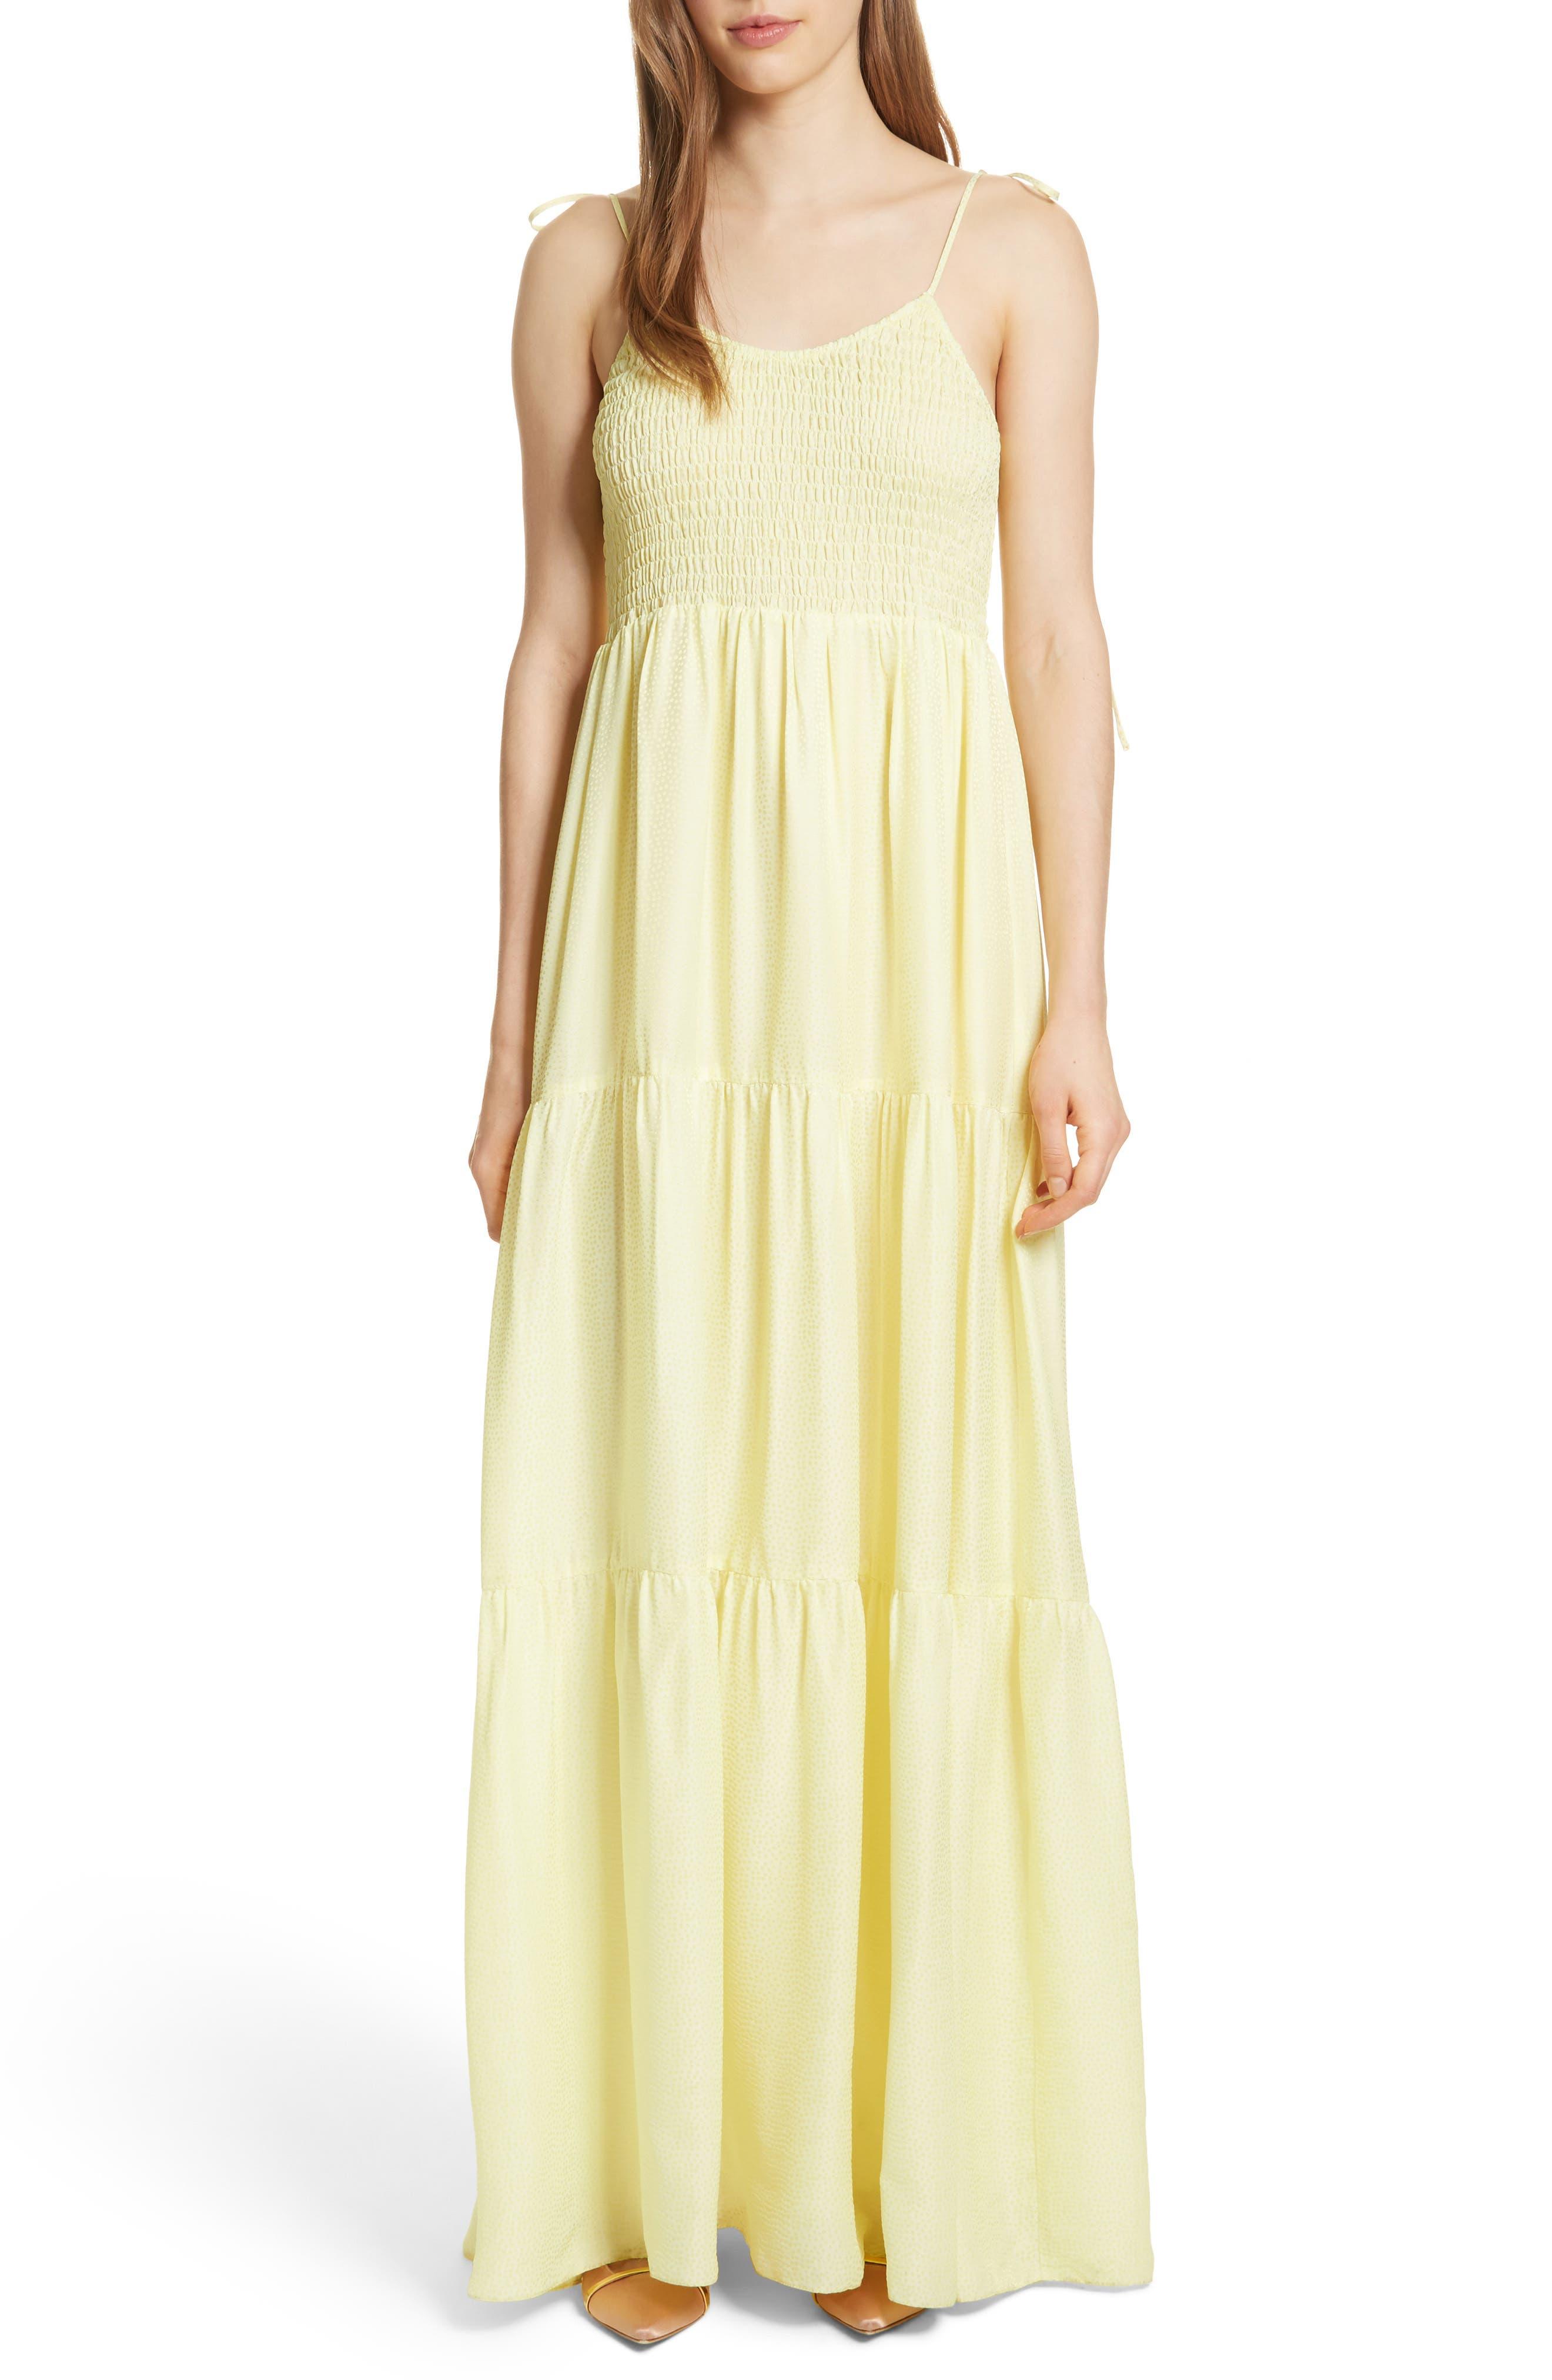 Prose & Poetry Inaya Maxi Dress,                         Main,                         color, 741